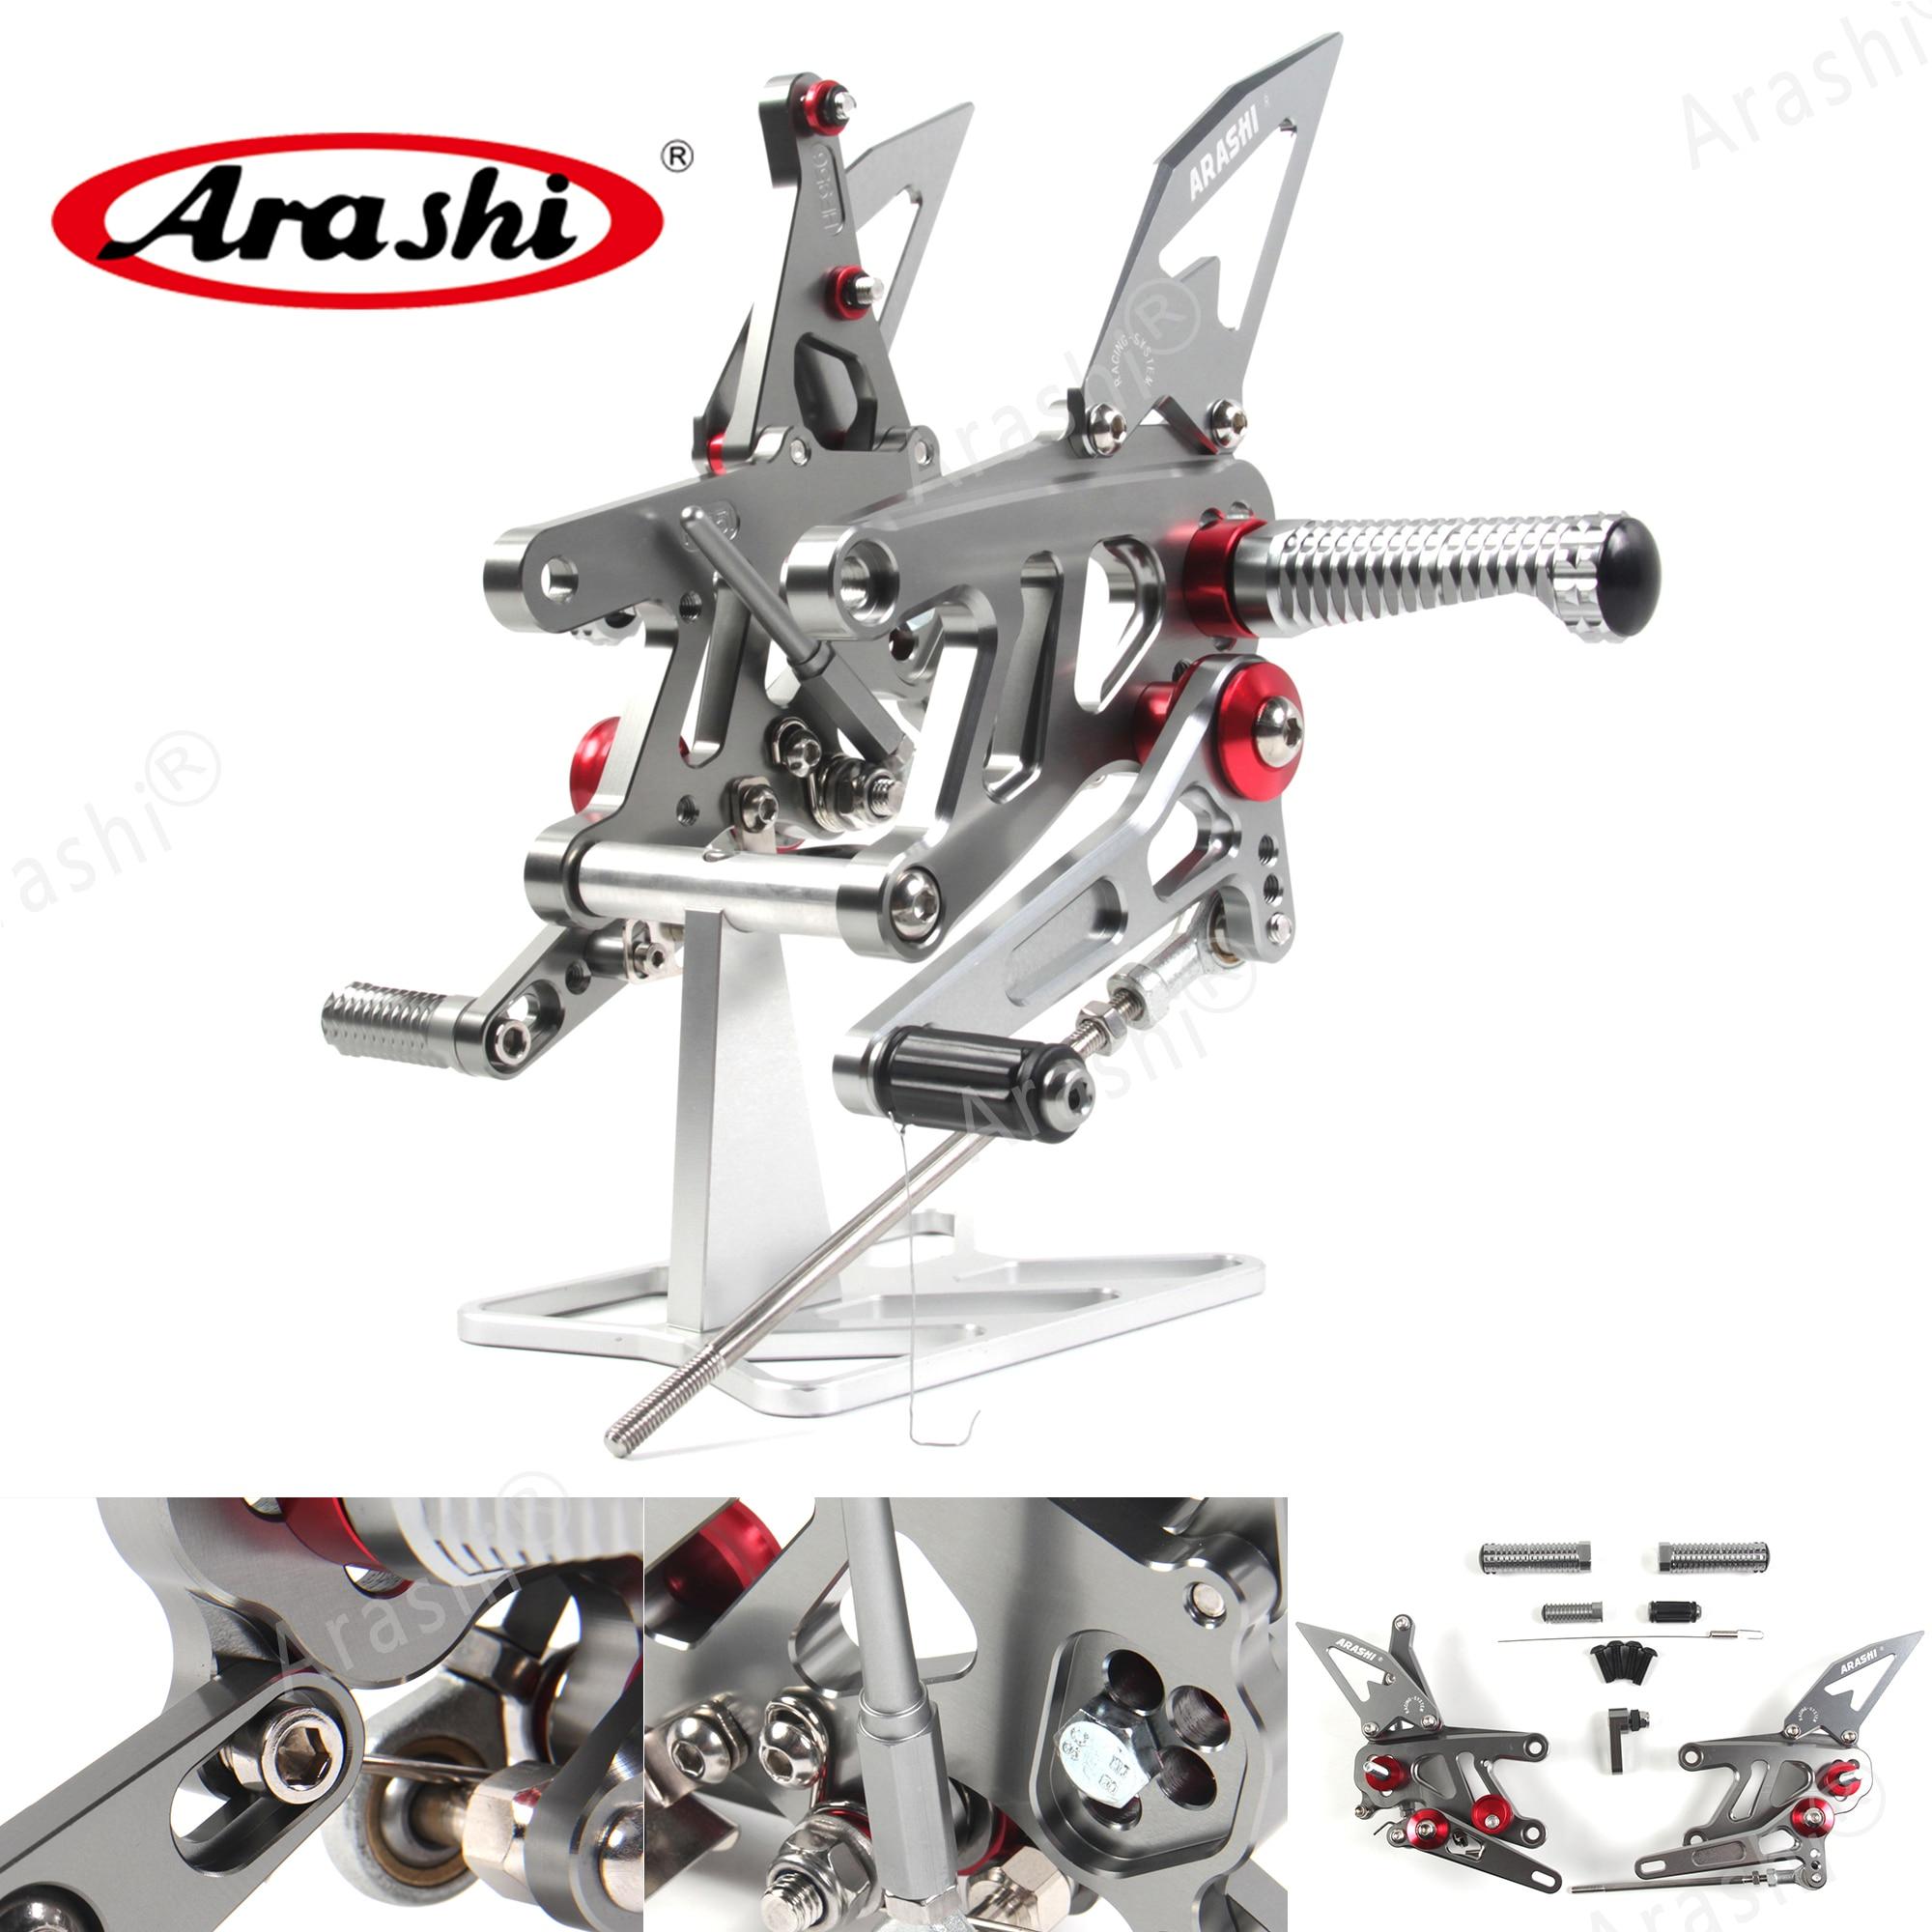 Arashi para APRILIA RSV4 FACTORY APRC ABS 2013-2016 CNC reposapiés ajustables reposapiés RSV 4 2014 2015 SEK SE 2013